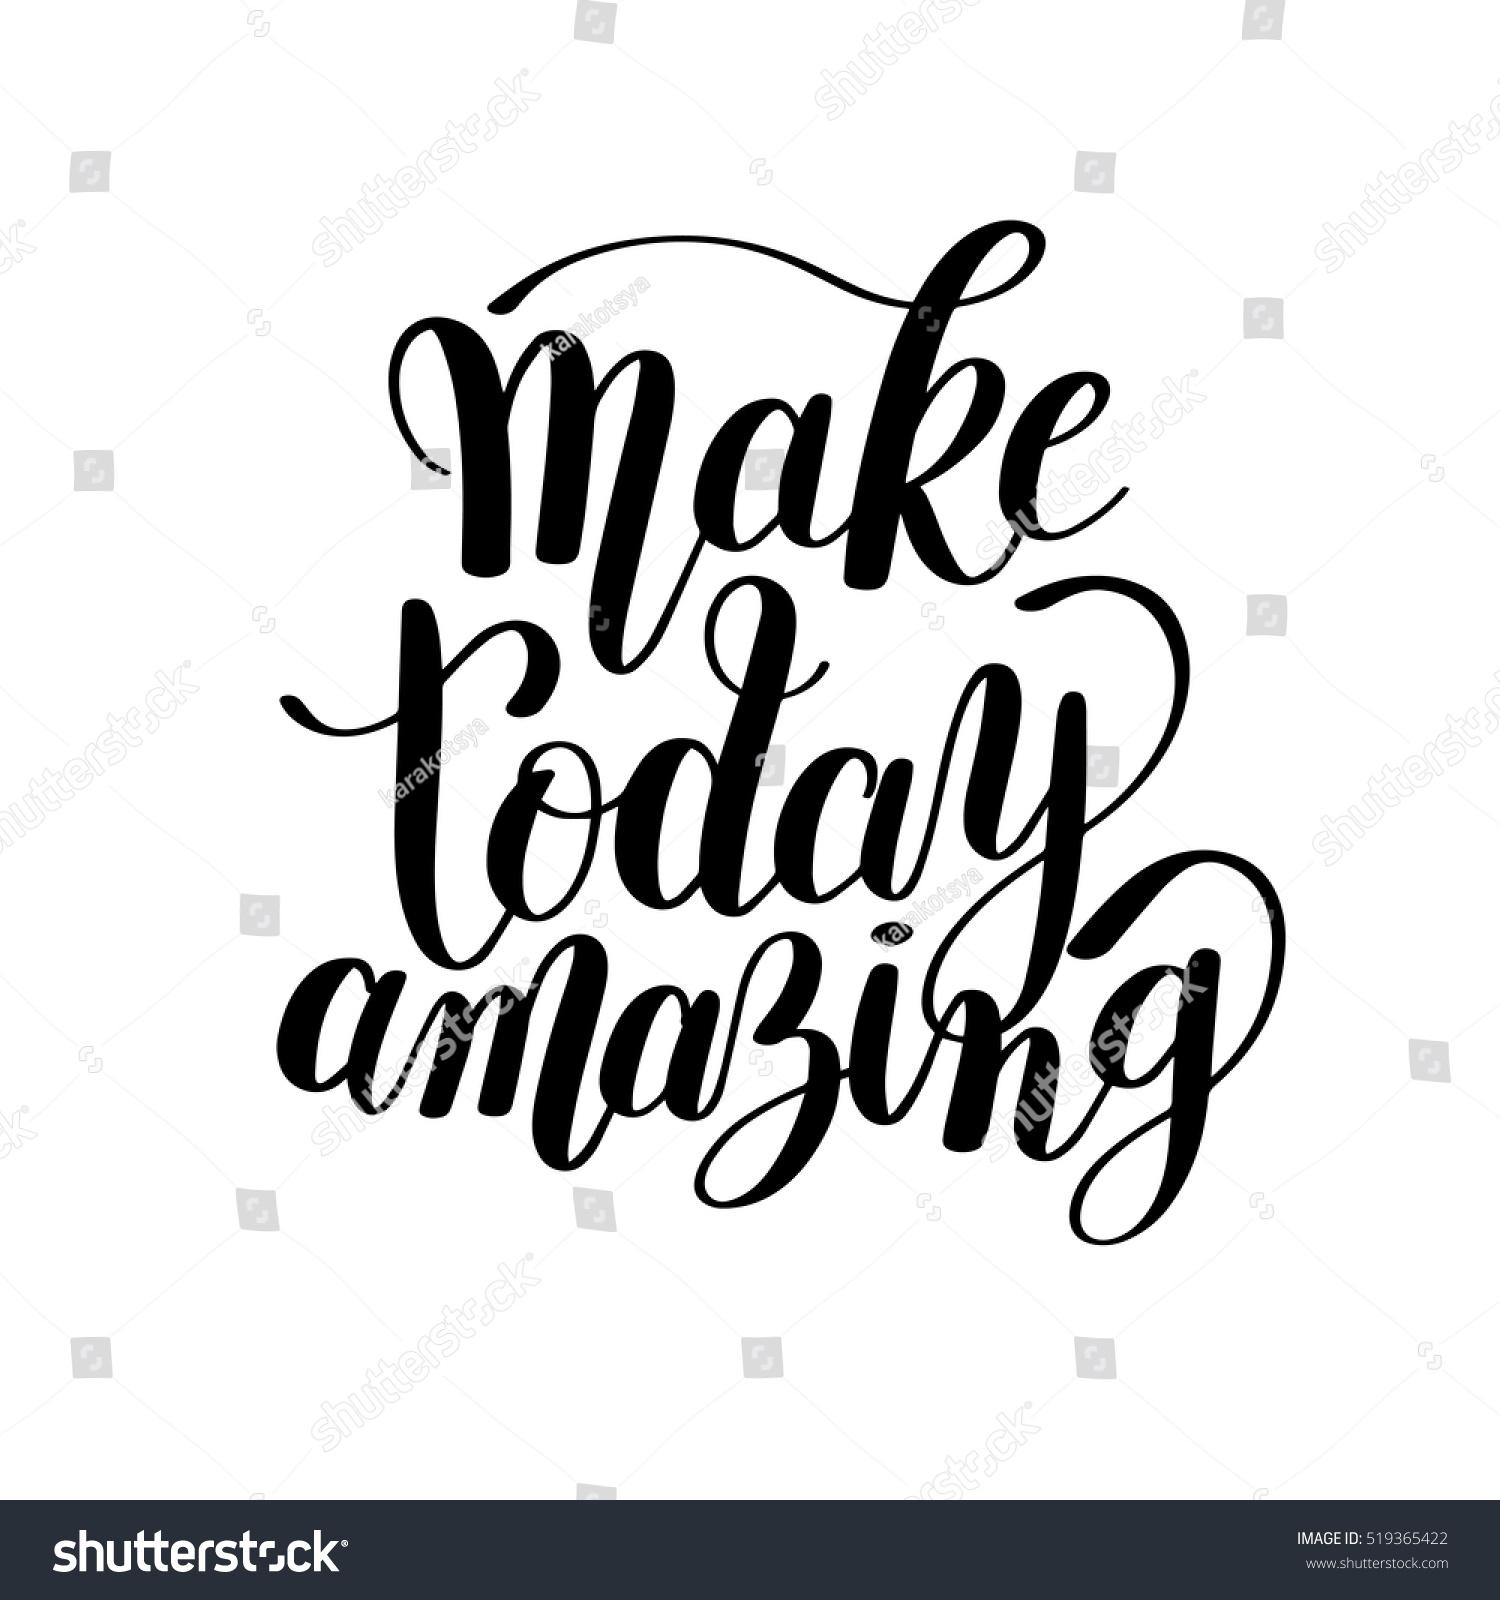 make today amazing black ink handwritten stock vector royalty free